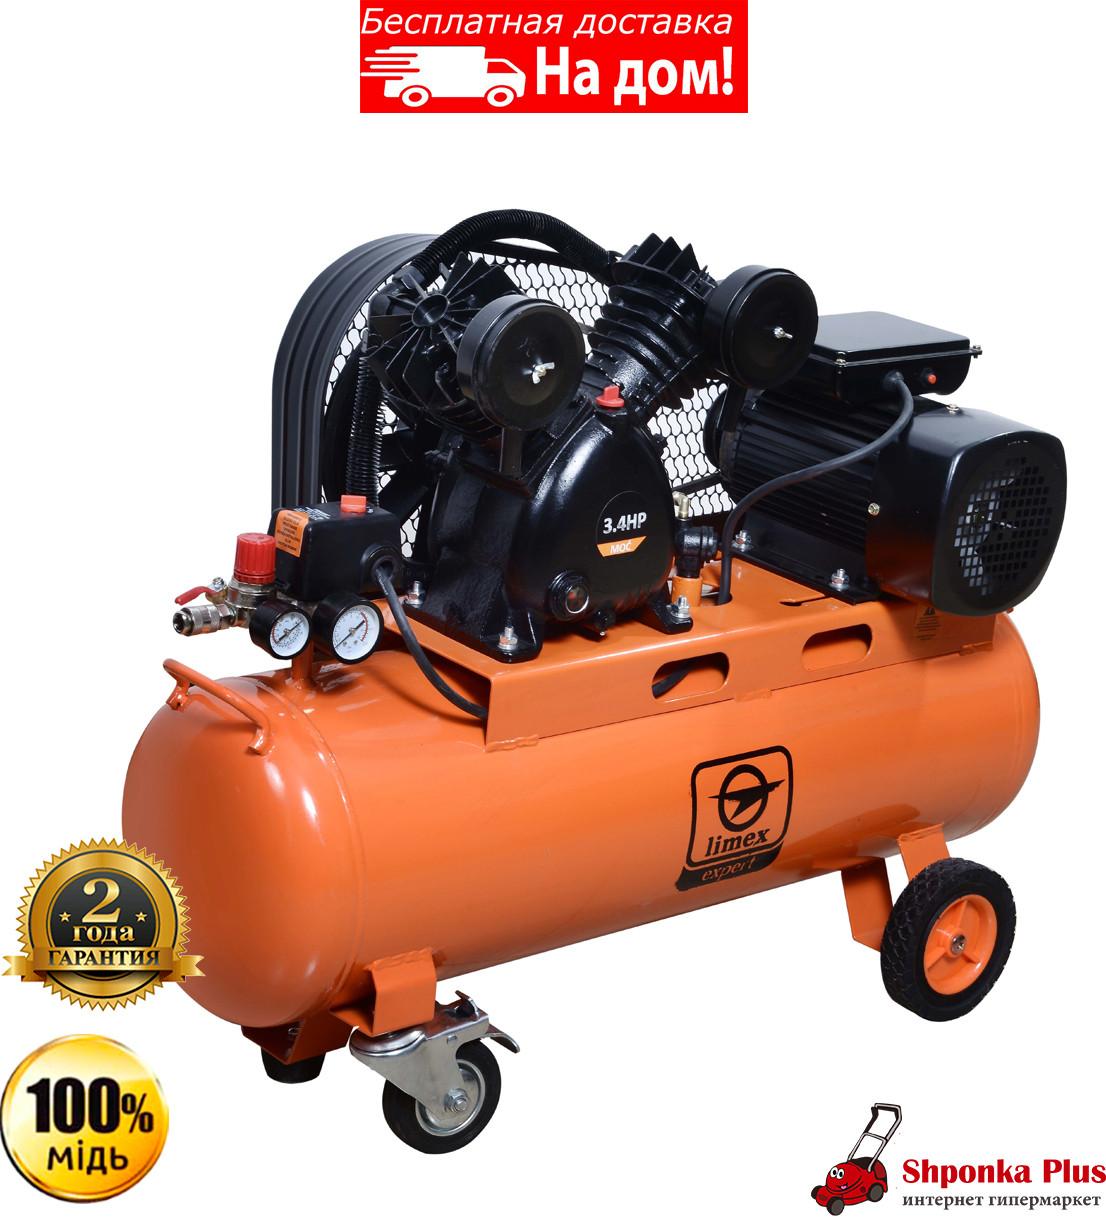 Компрессор ремень, 2 цилиндра, 50 л, 2,5 кВт, 360 л/мин., 10 бар Limex expert CB-50360-2.5